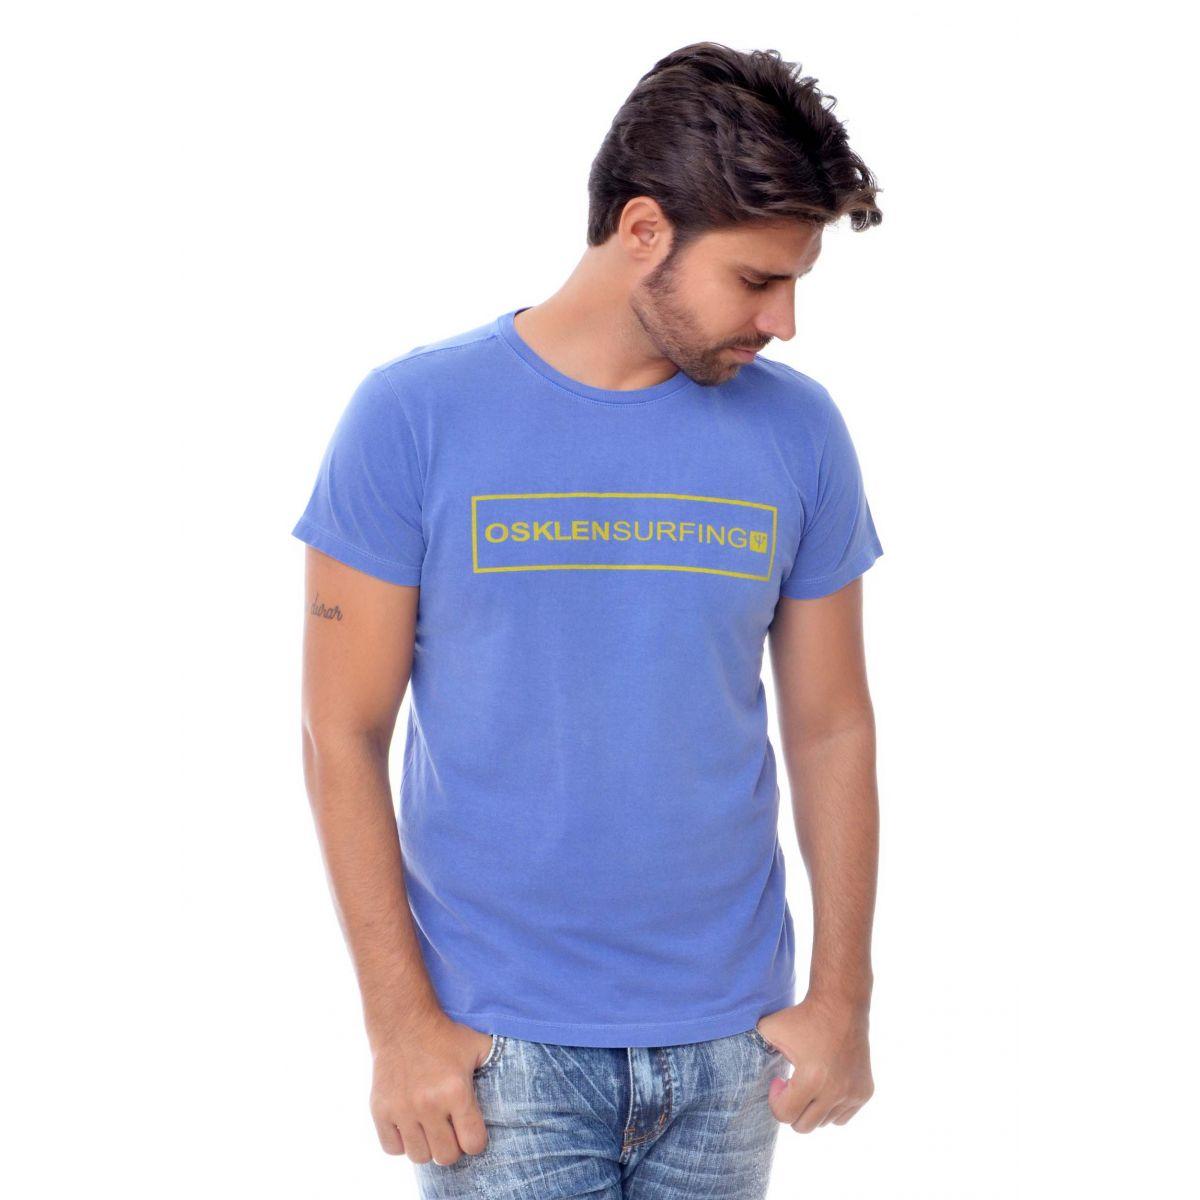 Camiseta Osklen Surfing Azul  - Ca Brasileira